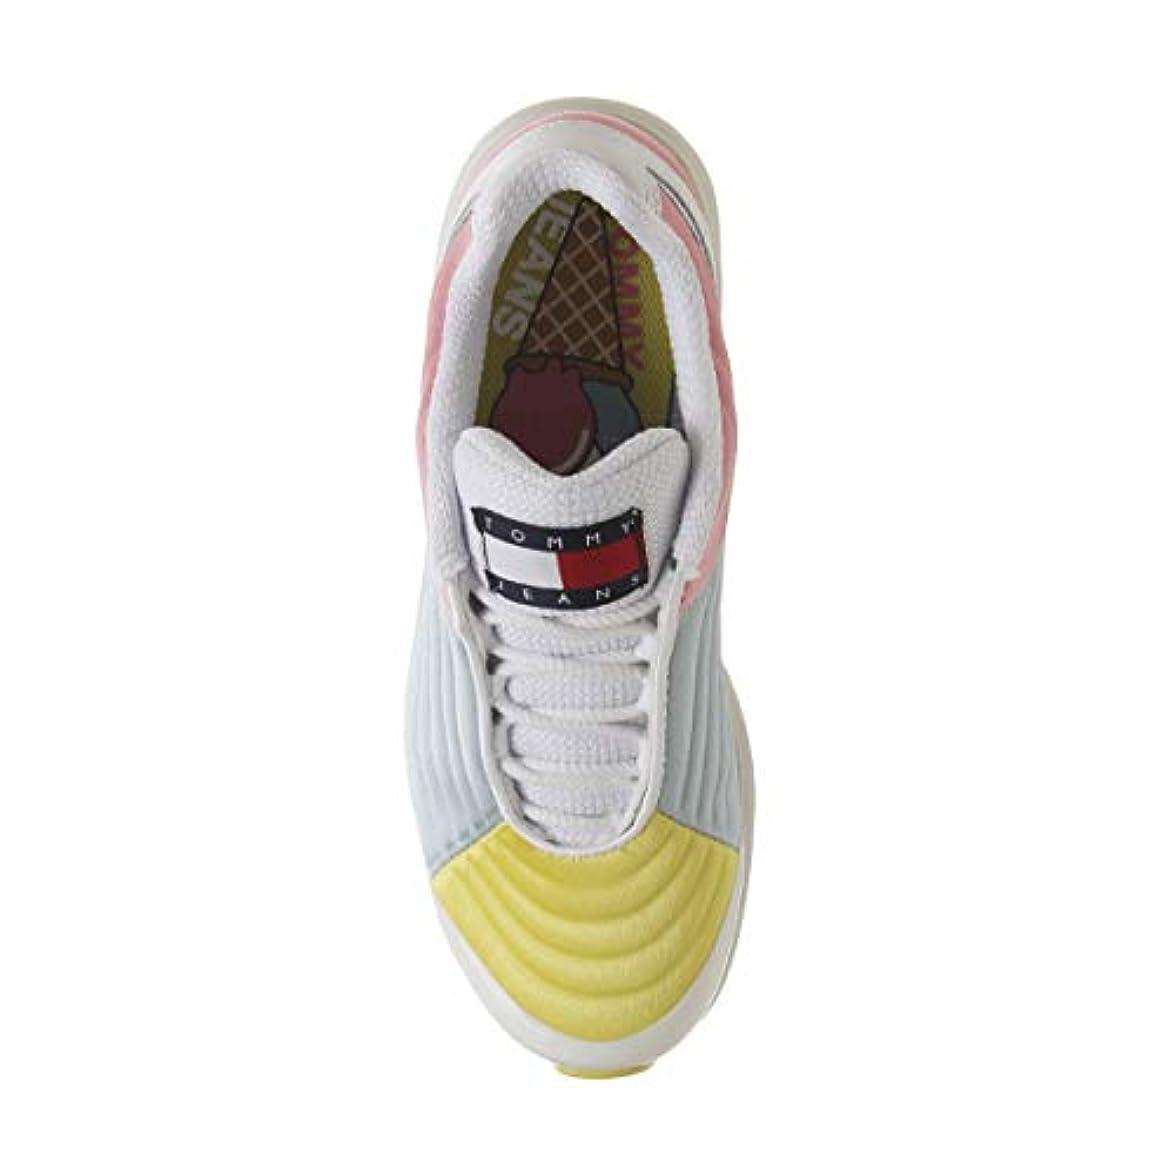 Tommy Hilfiger Sneaker Colorblock Woman